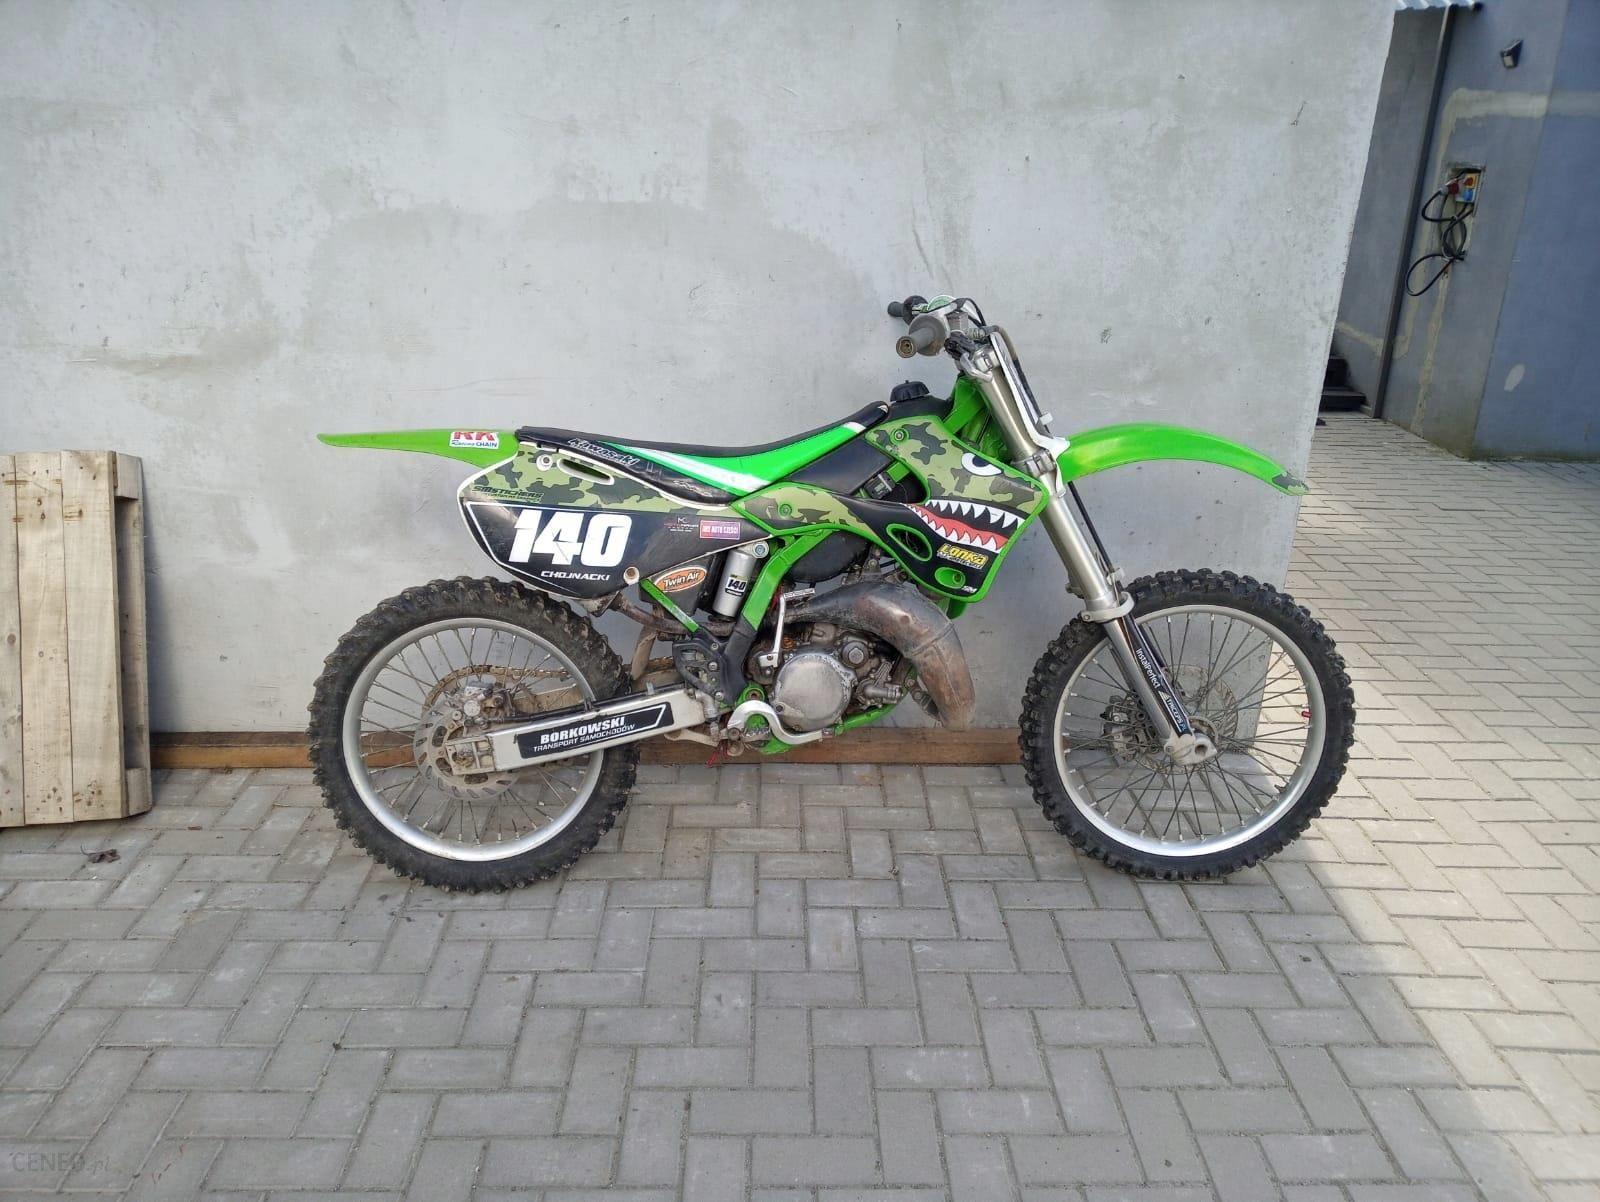 Kawasaki Kx 125 Opinie I Ceny Na Ceneo Pl